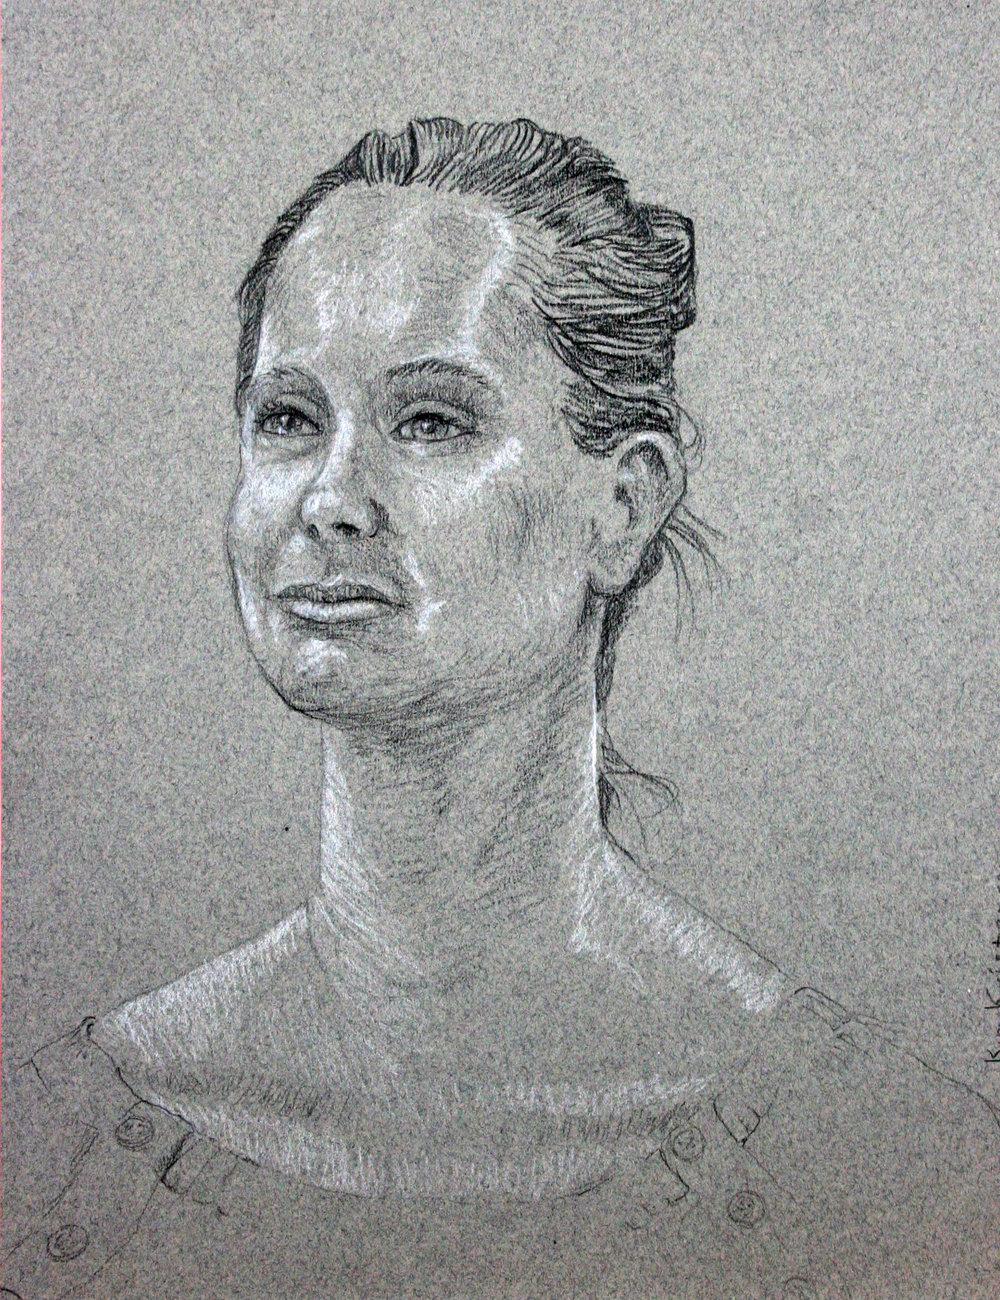 Kim Kristensen did this drawing .